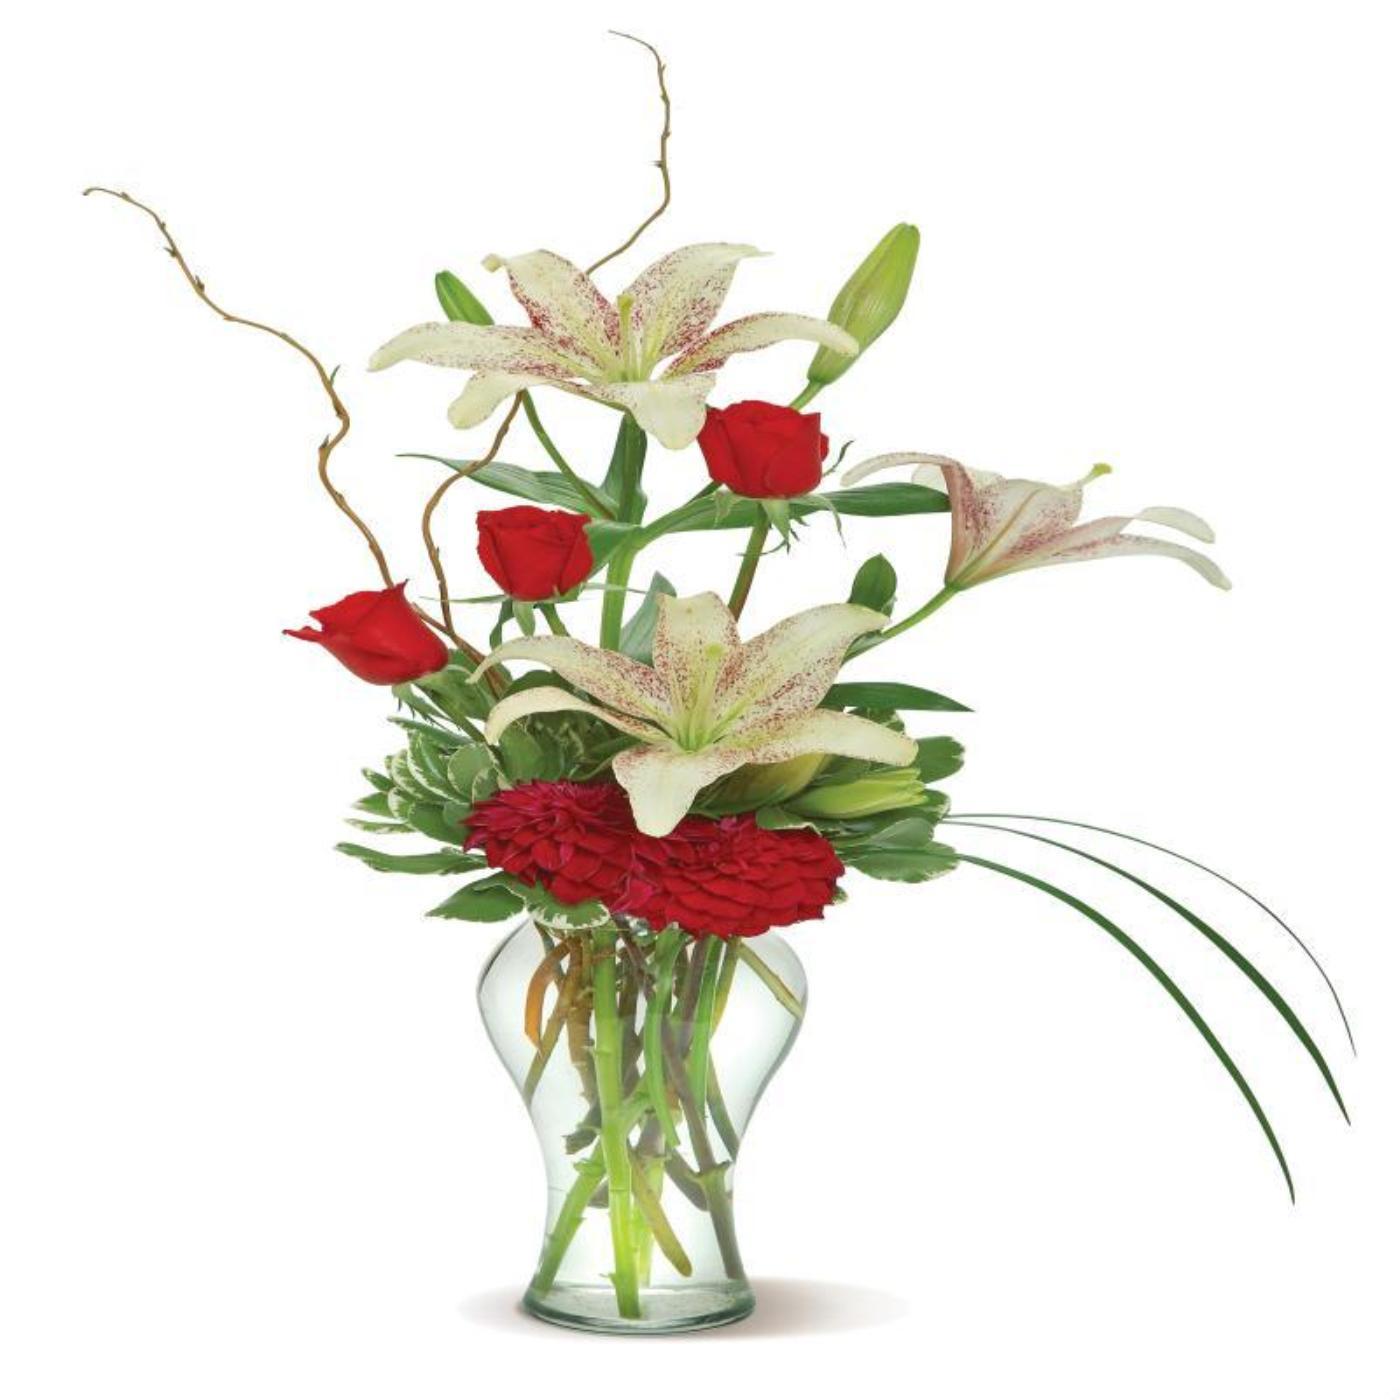 Radiant Beauty Glass Vase Arrangement